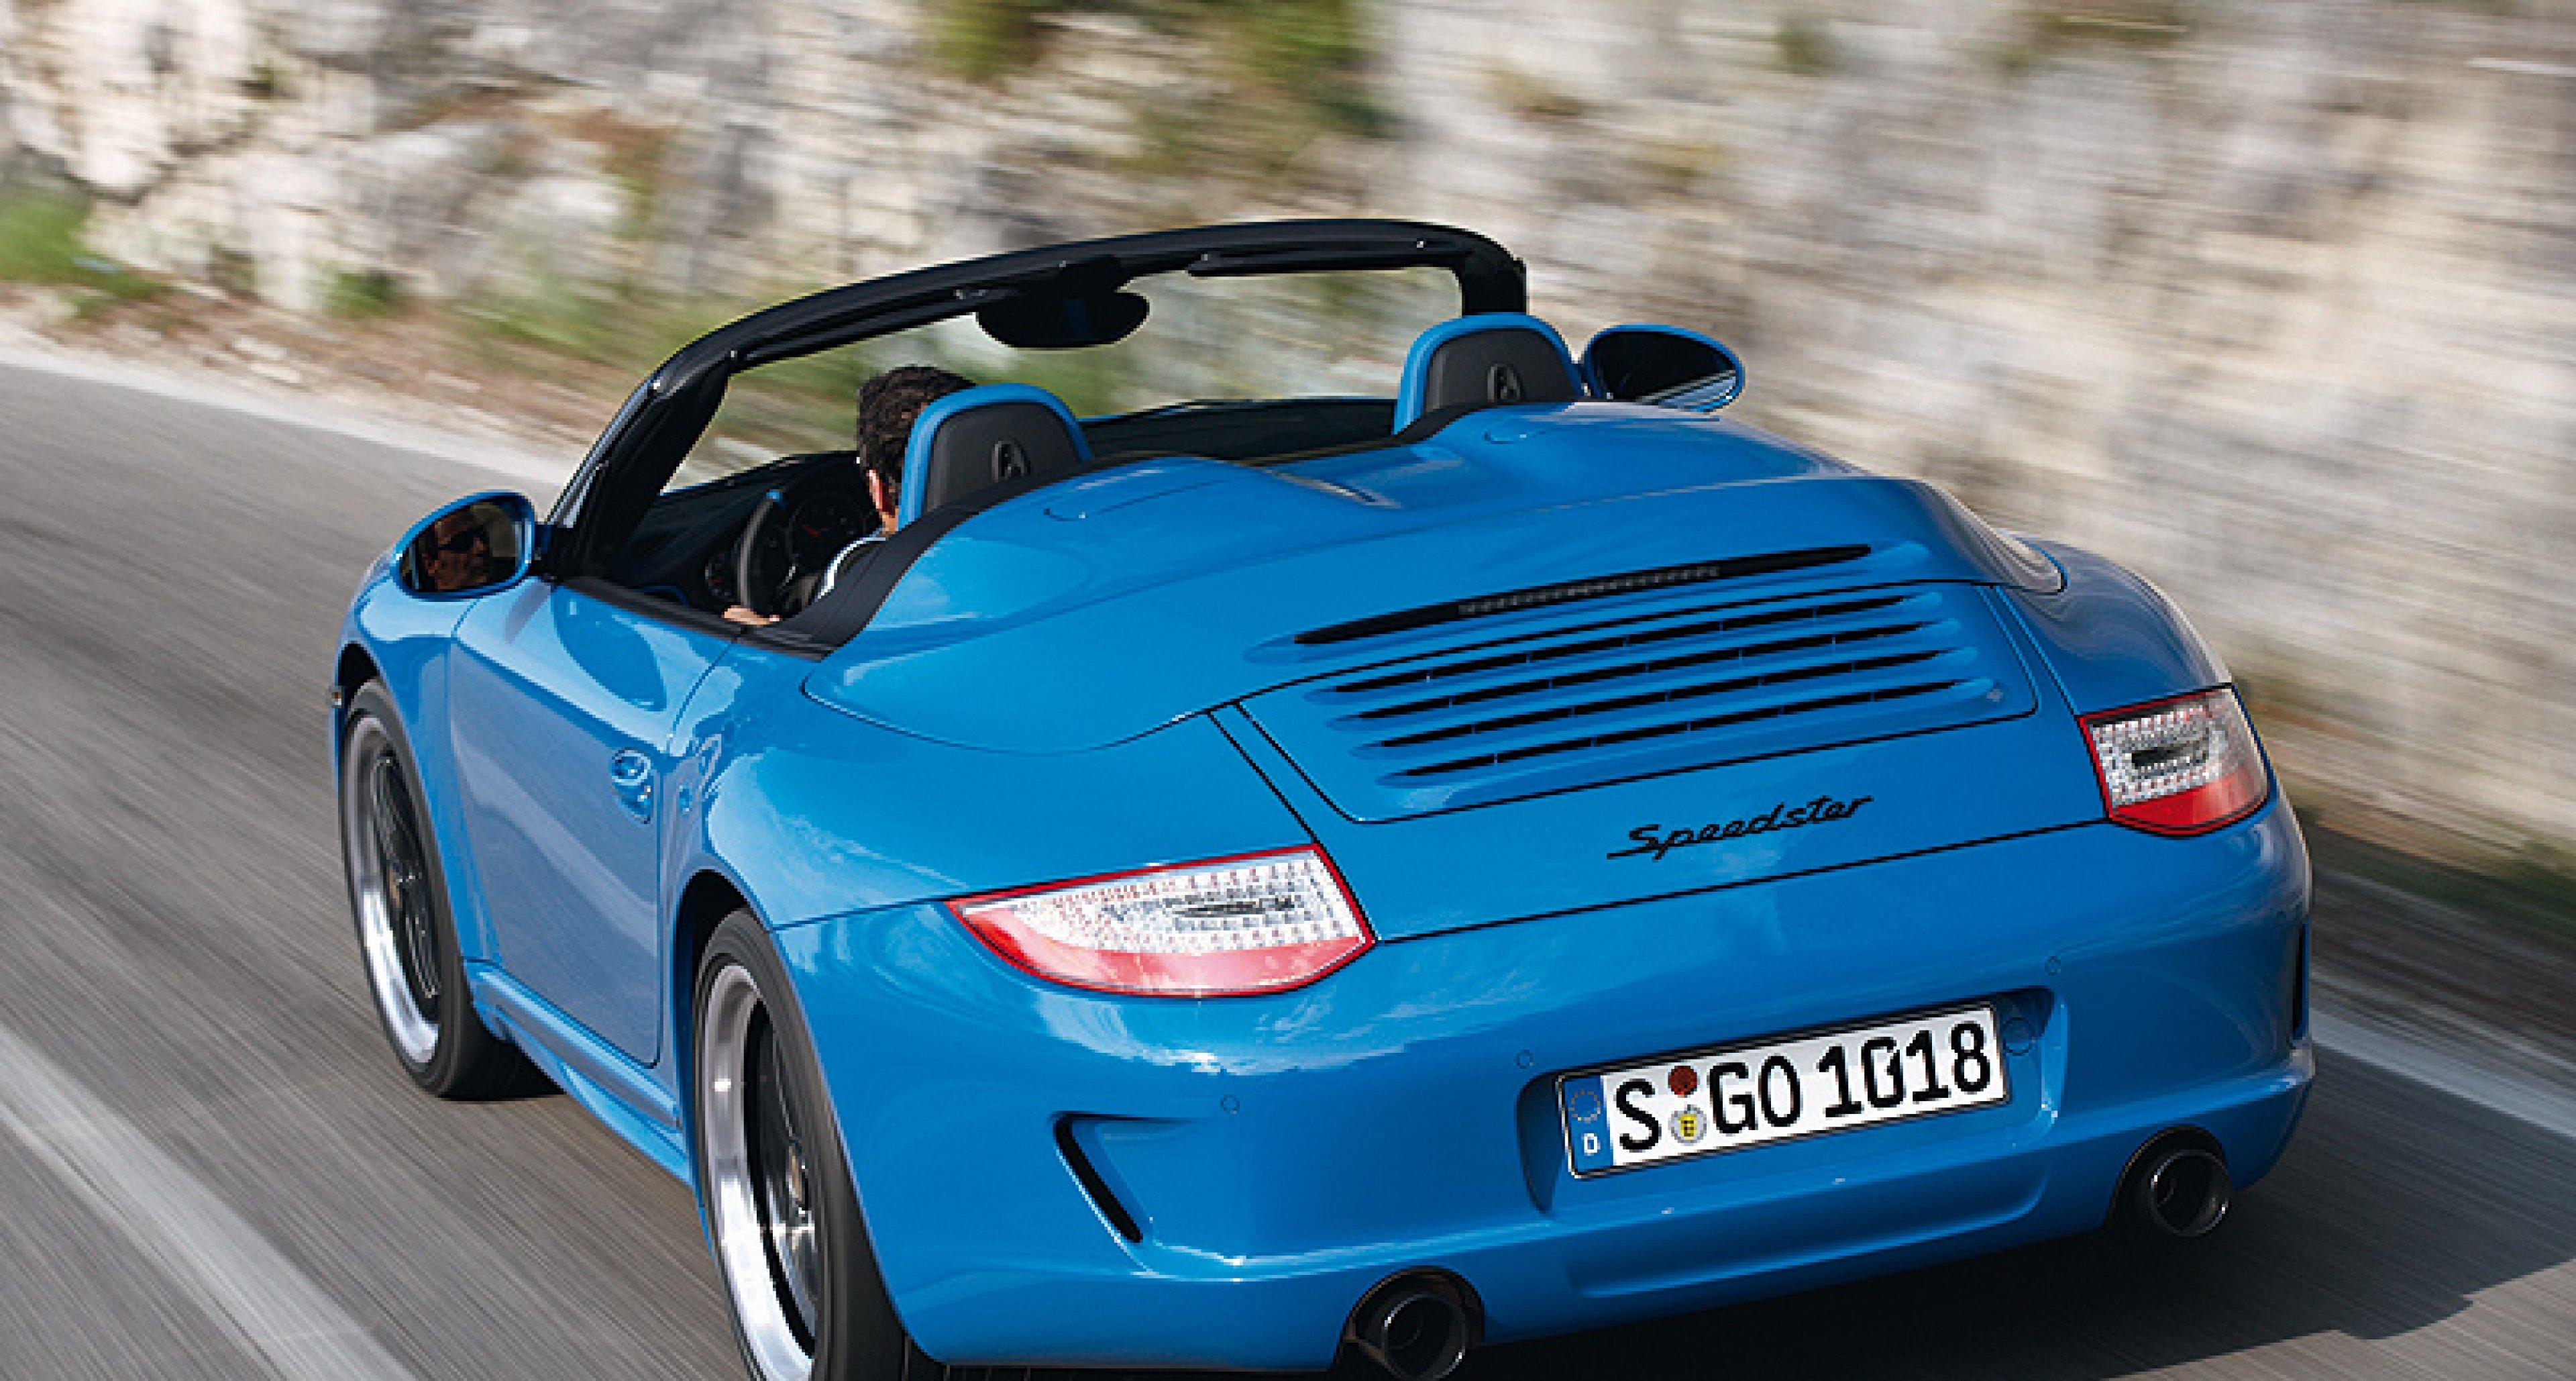 Porsche Exclusive to Produce New 911 Speedster